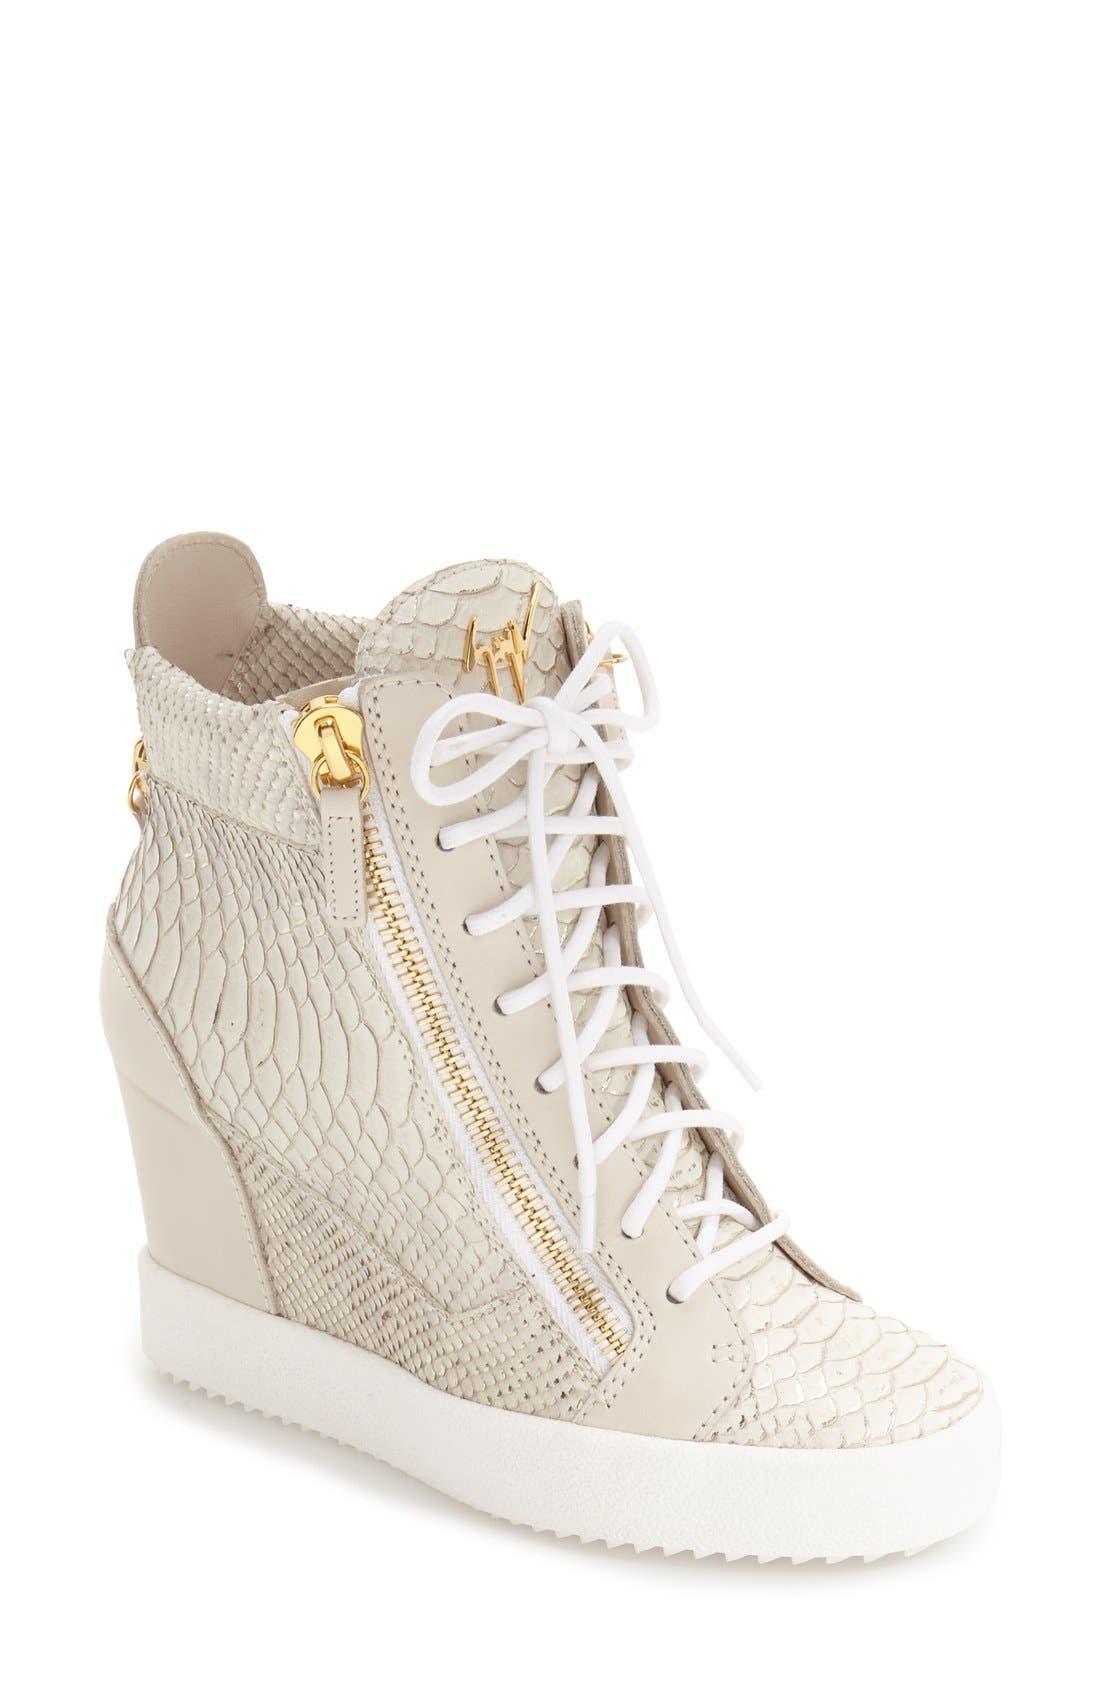 GIUSEPPE ZANOTTI Ofelia Wedge Sneaker, Main, color, 040